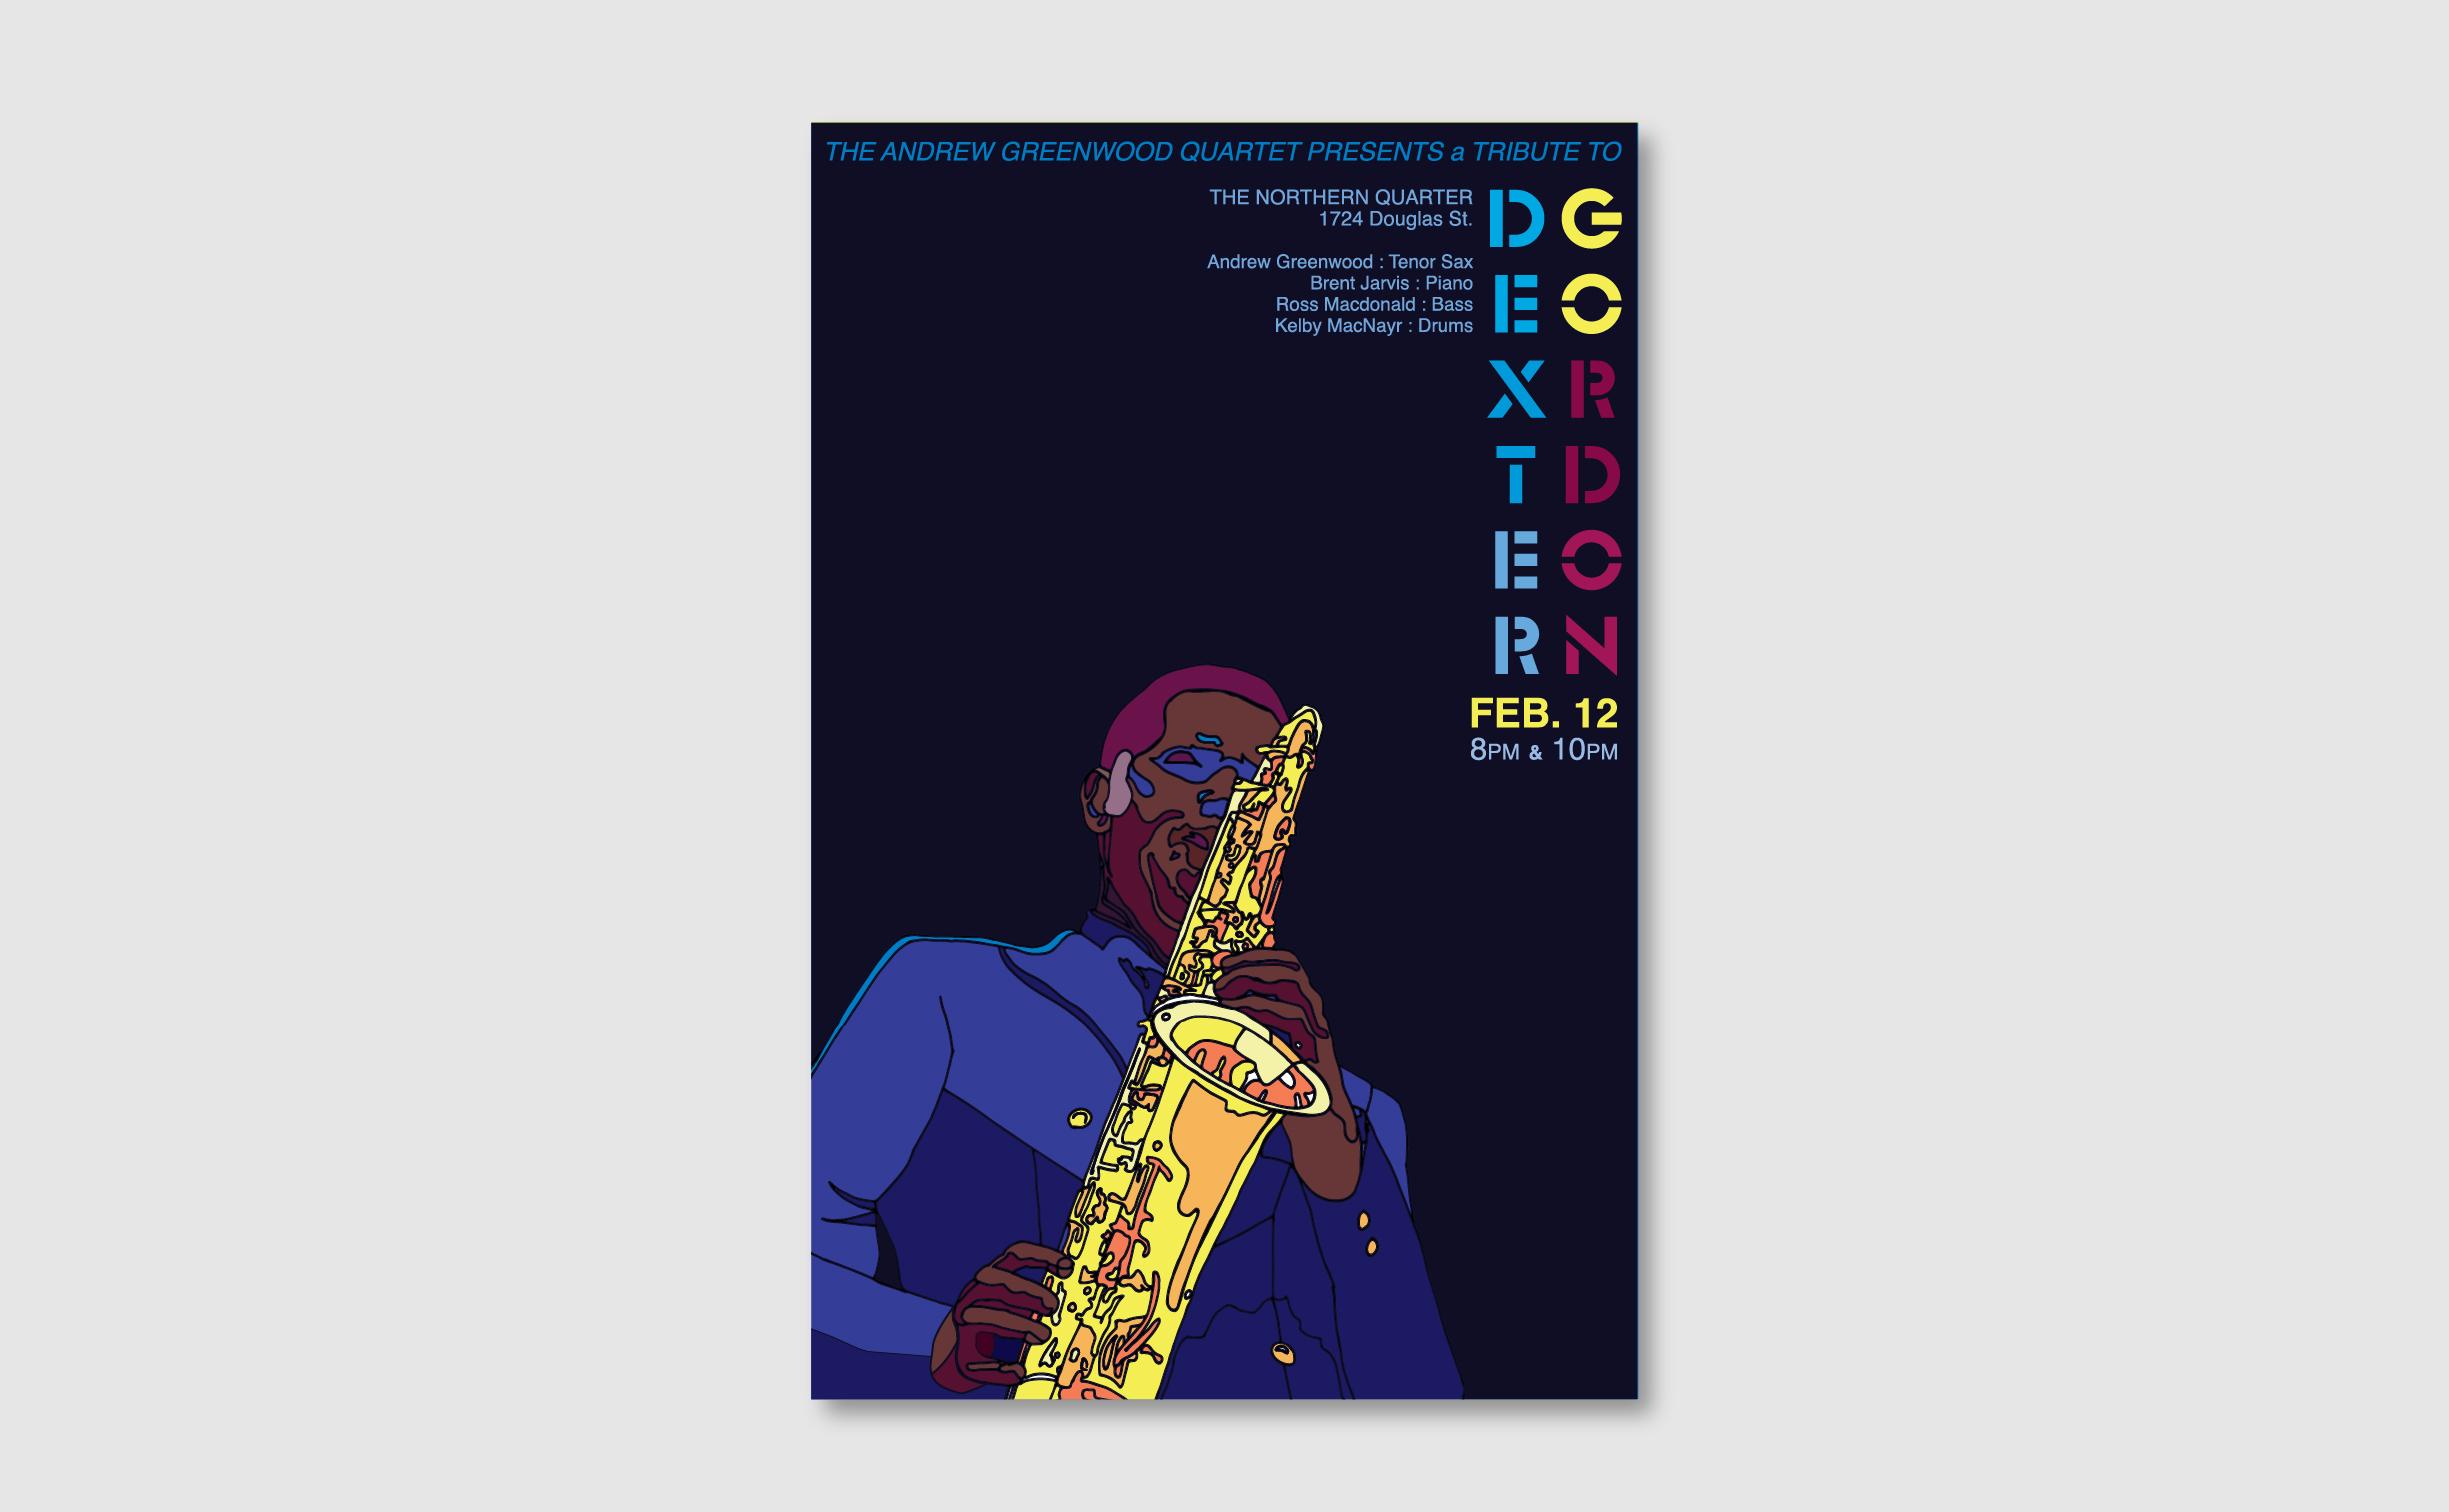 Simeon-Goa_Victoria-Canada_Graphic-Design_Illustration-victoria-jazz-orchestra_Dexter-Gordon.jpg